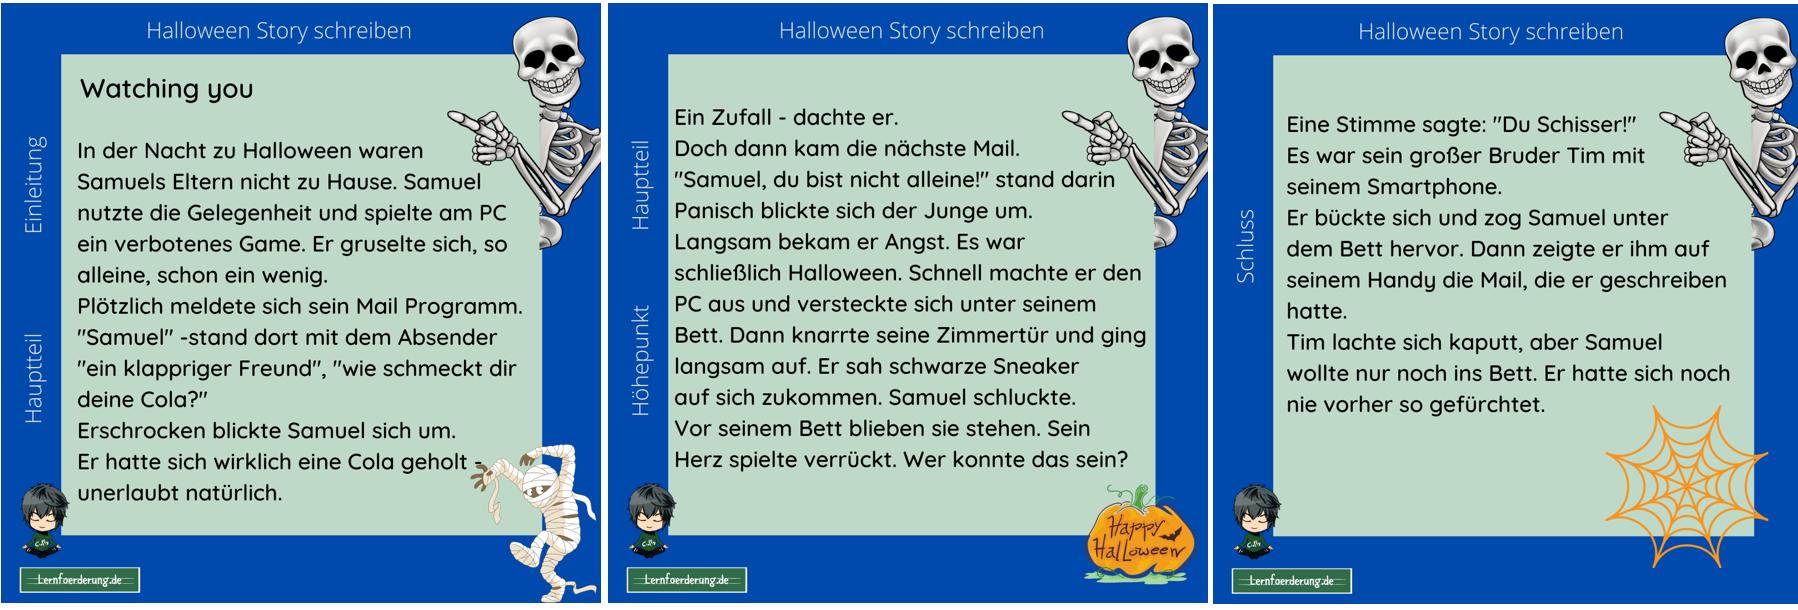 Halloween Gruselgeschichte schreiben